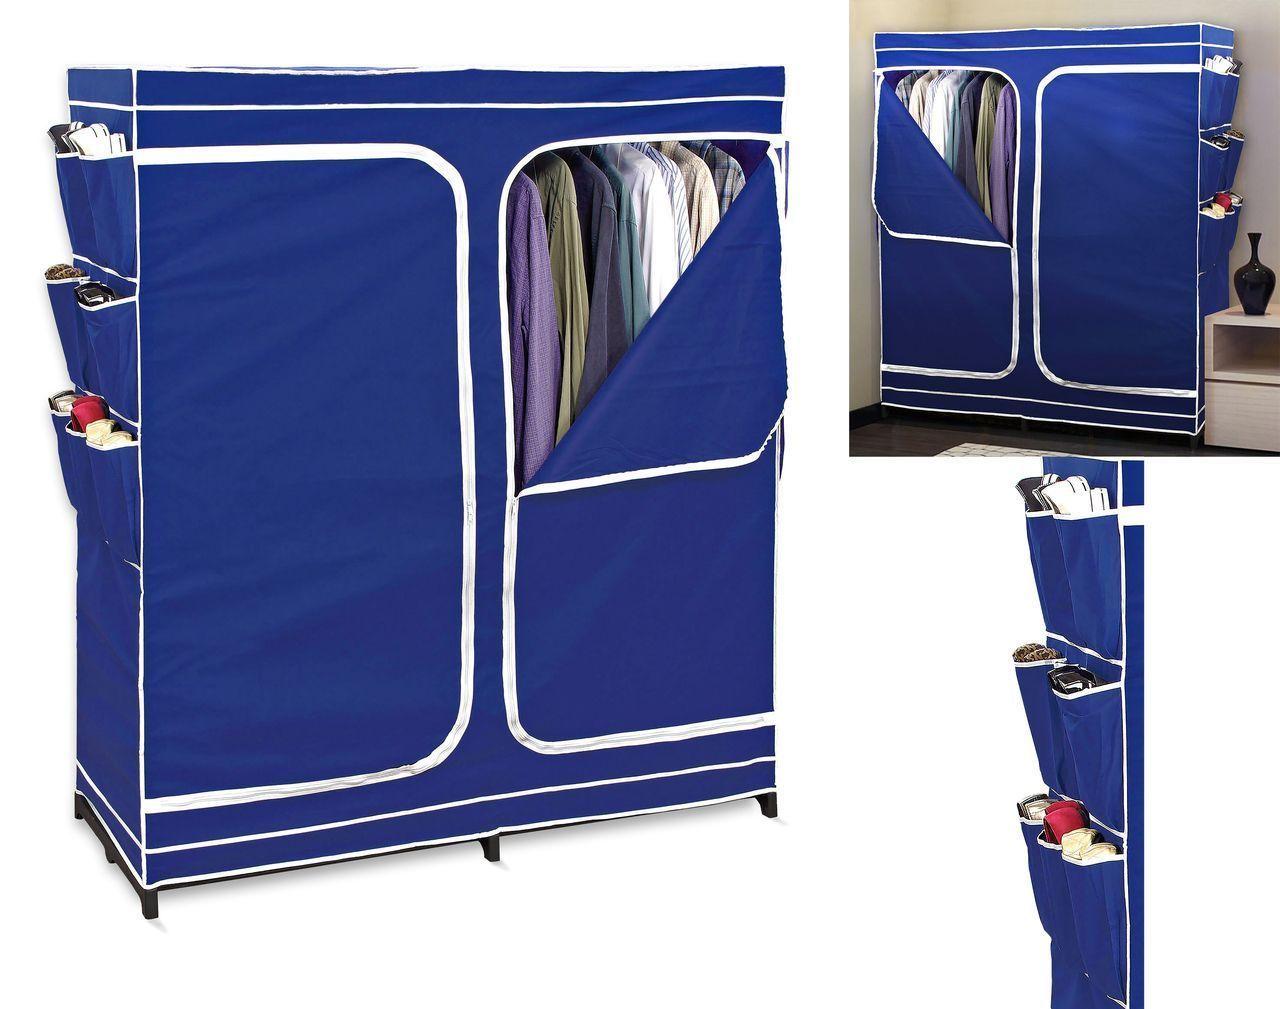 Double door closet season storage wardrobe organizer easy for Over wardrobe storage